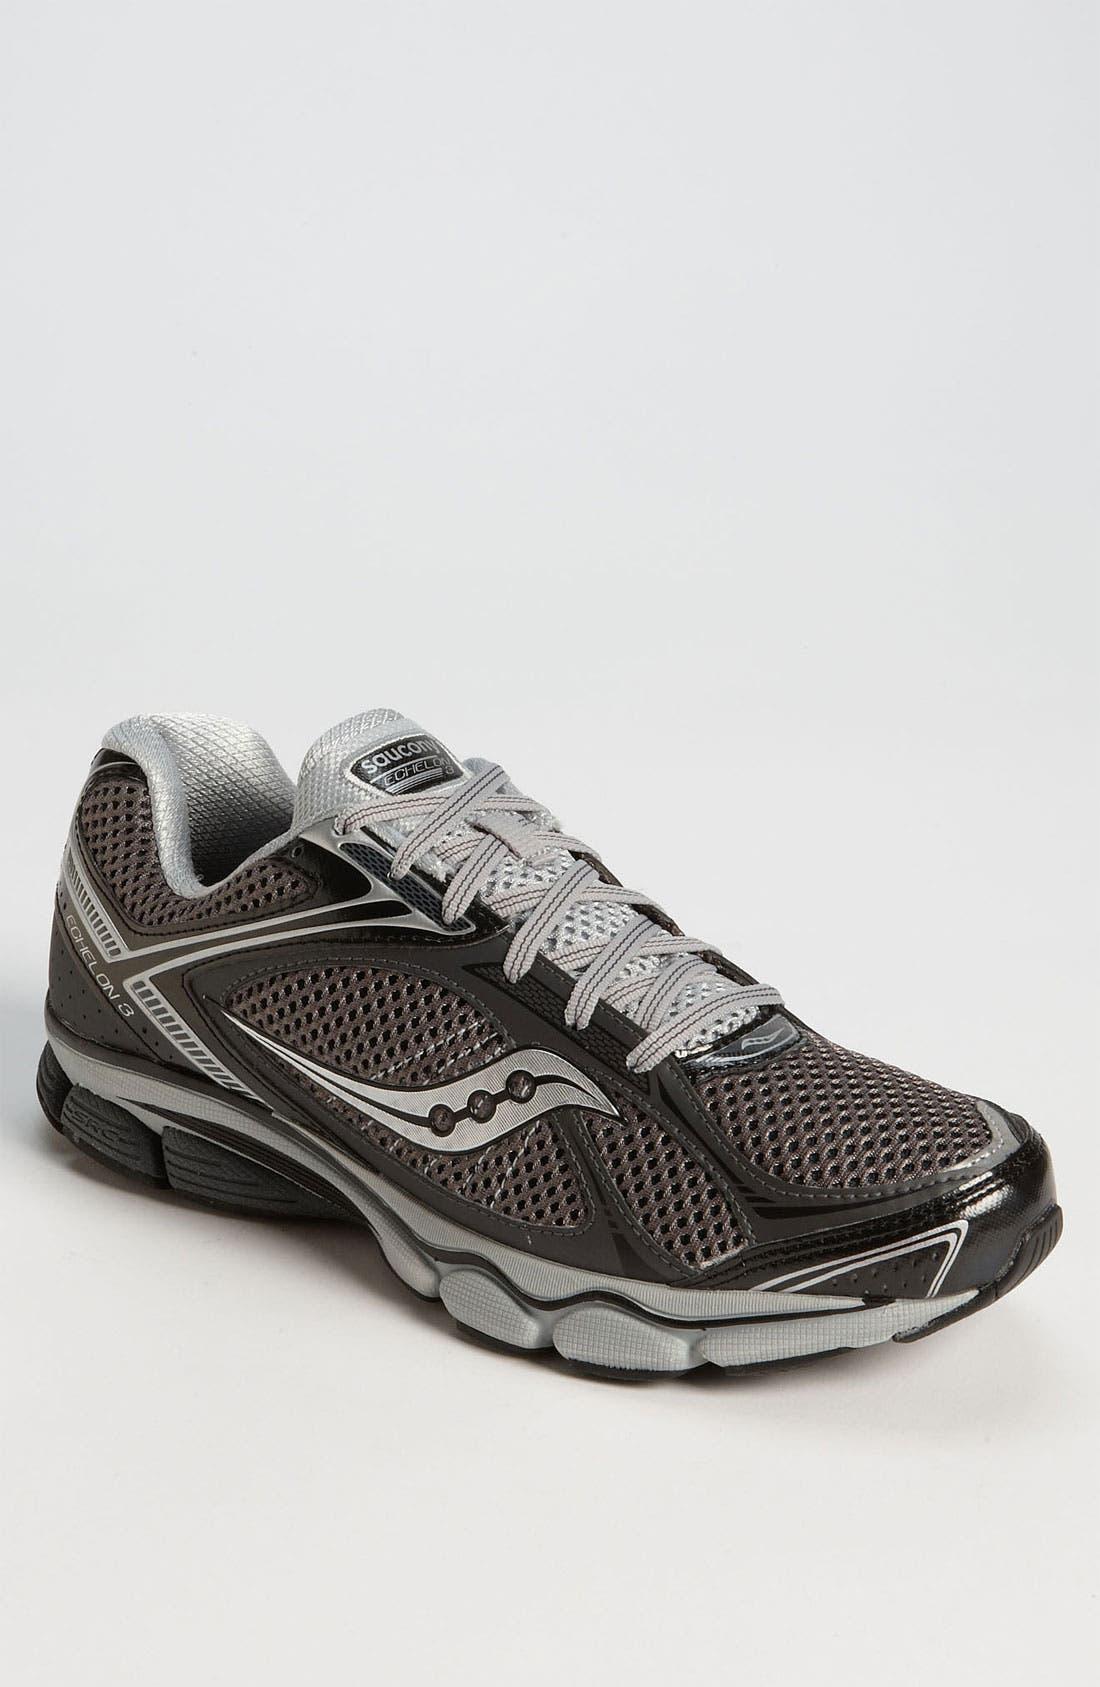 Alternate Image 1 Selected - Saucony 'ProGrid Echelon 3' Running Shoe (Men)